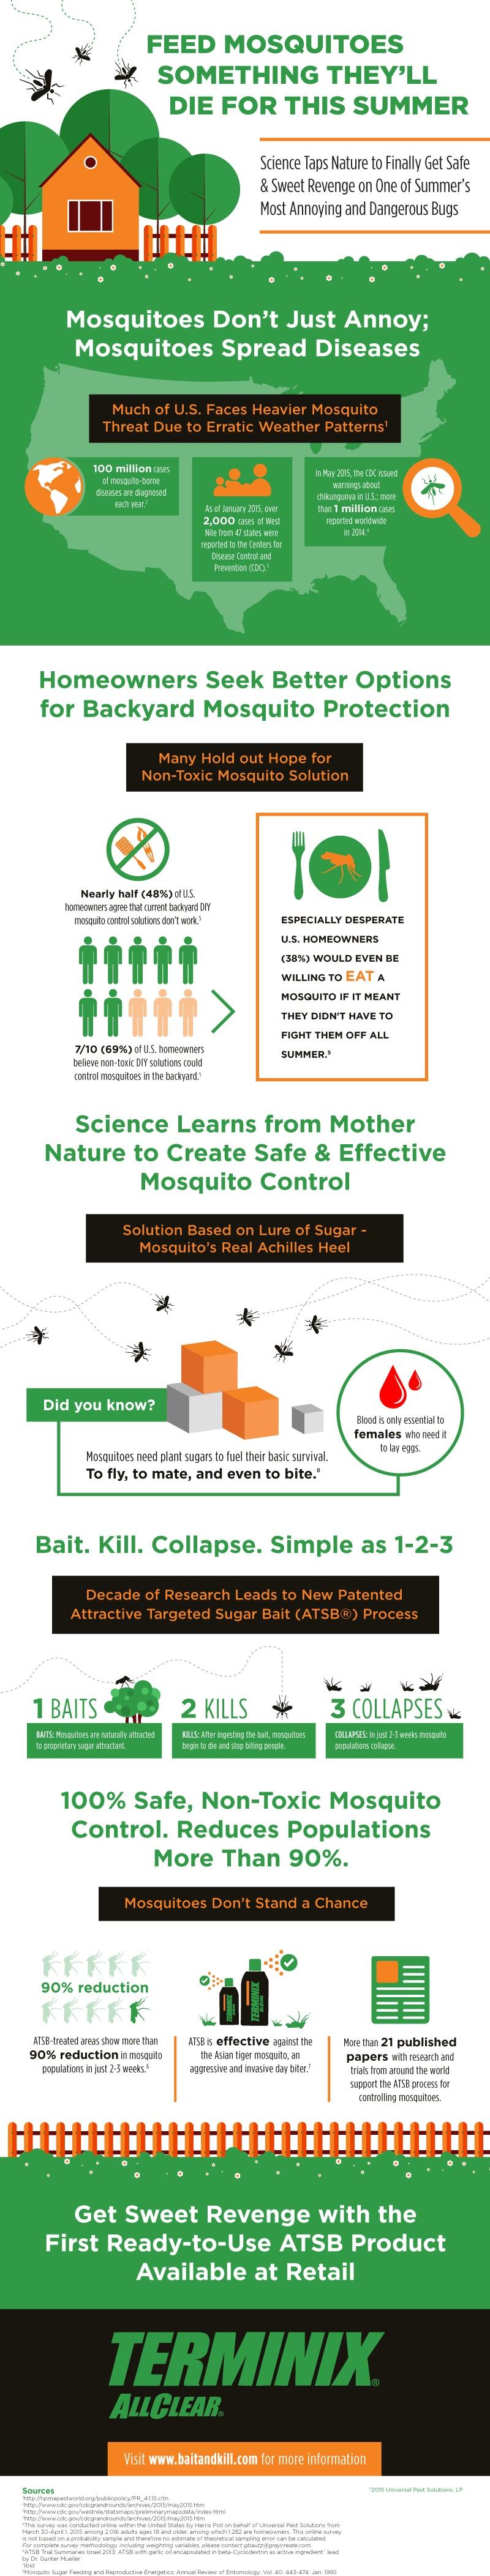 Terminix AllClear Mosquito Bait & Kill Infographic